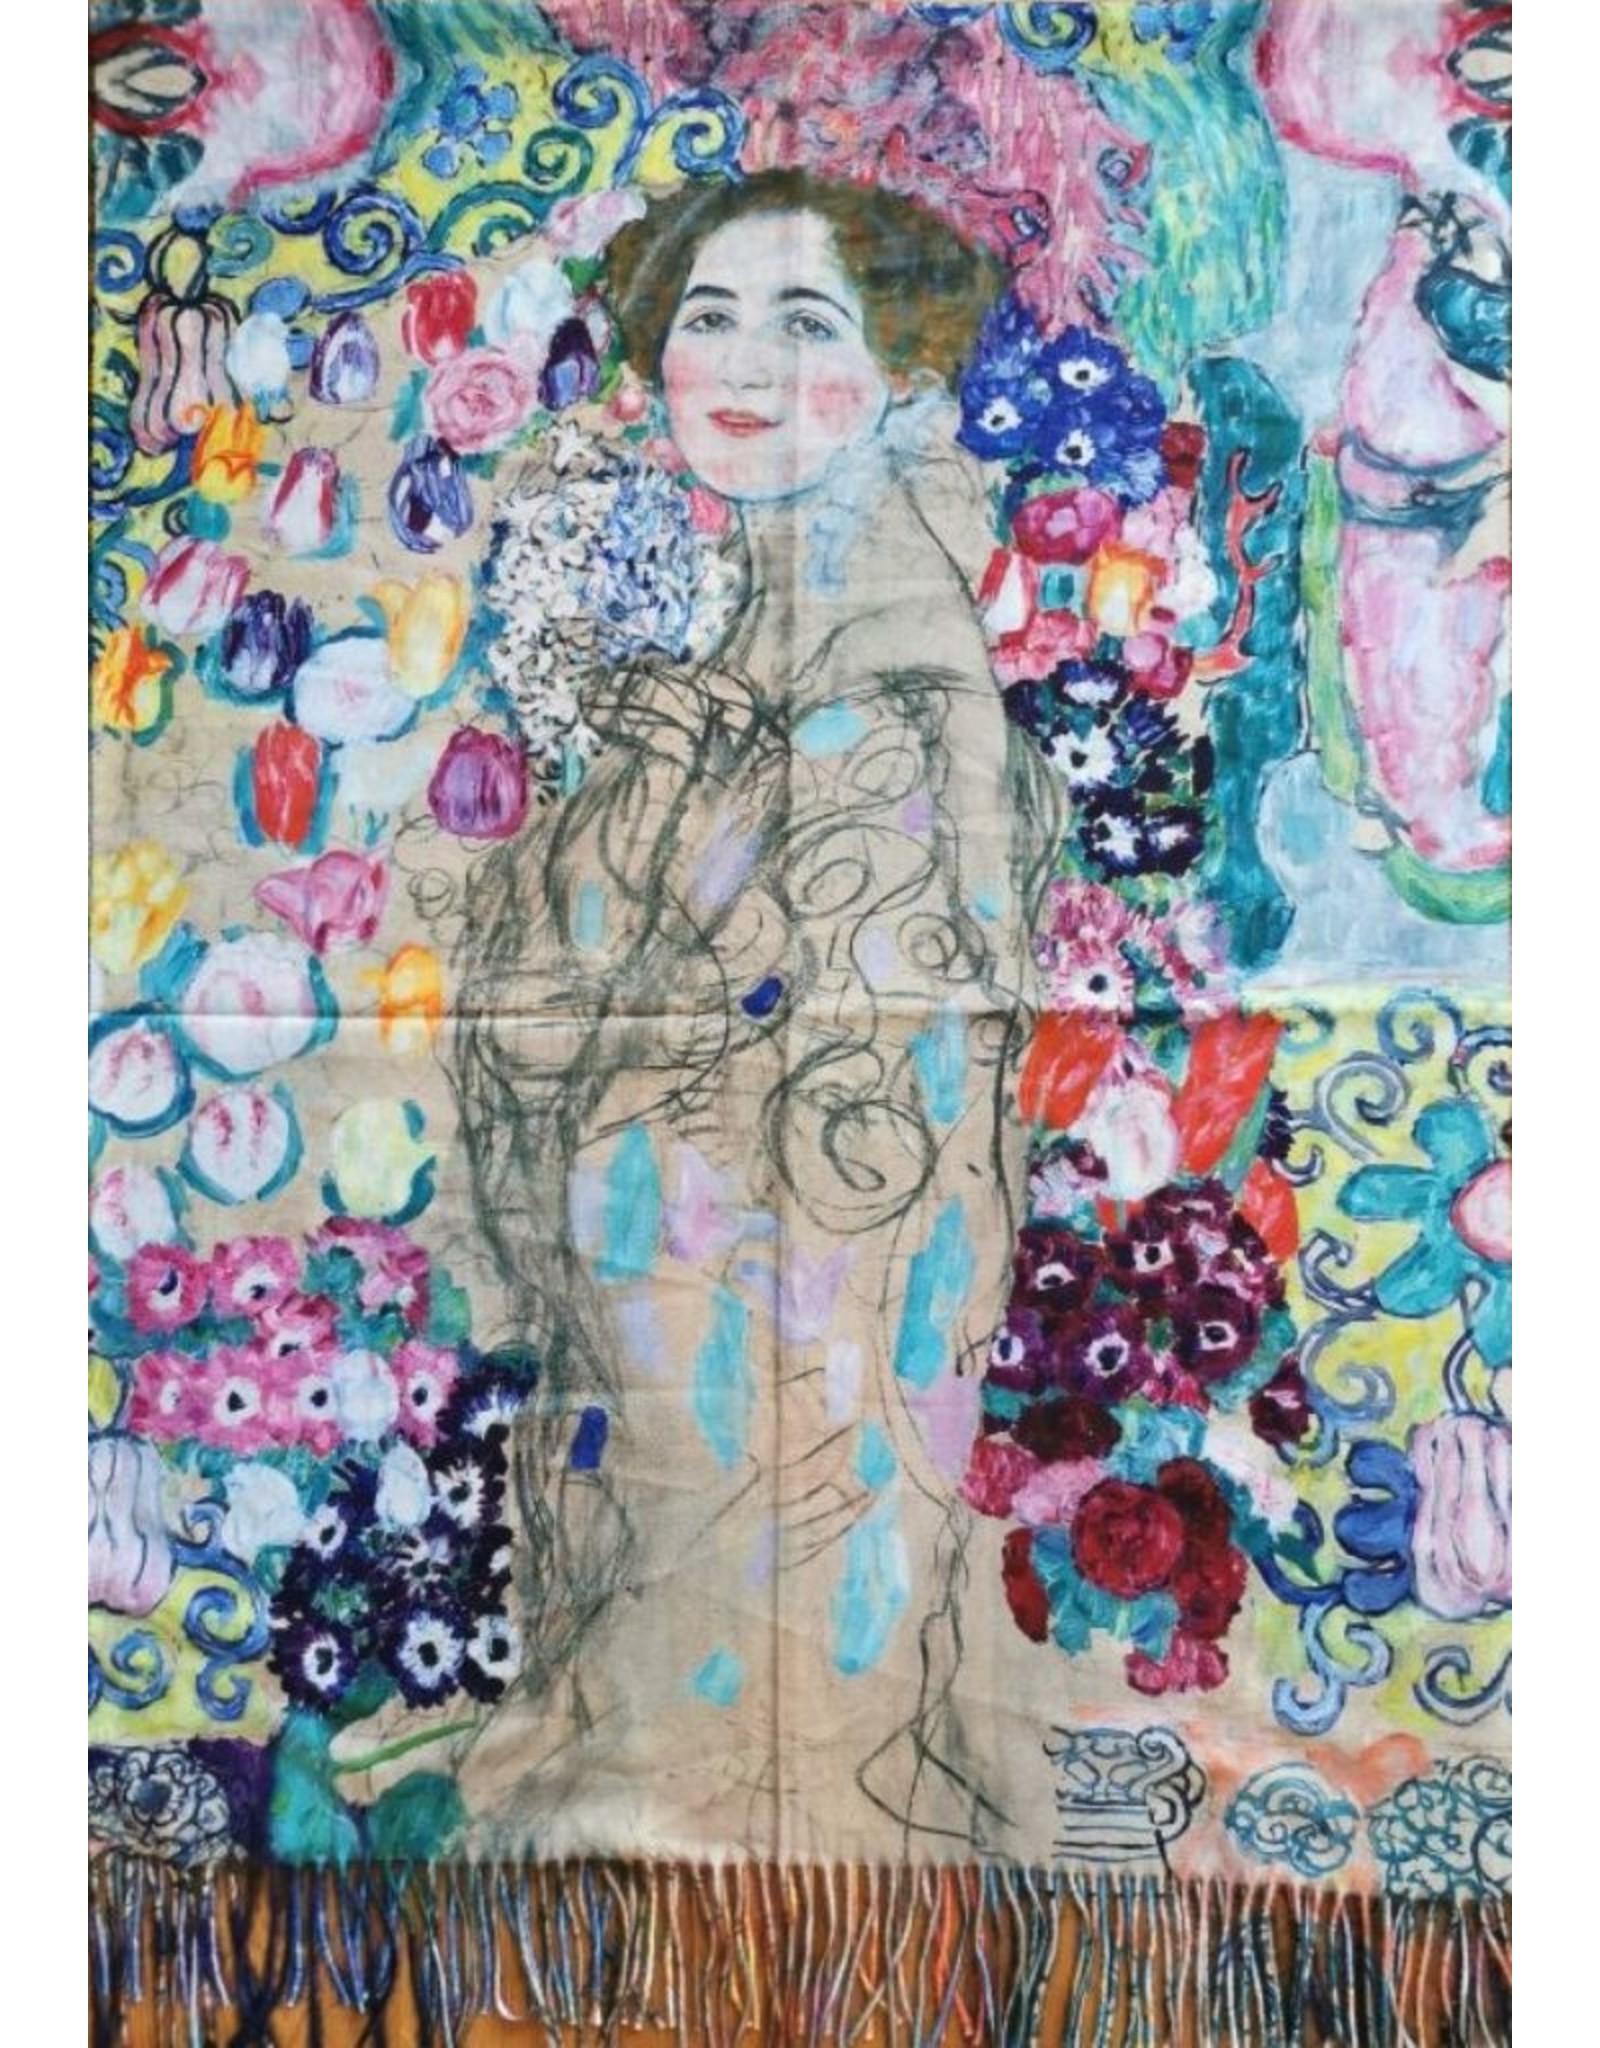 MC Miscellaneous - Omslagdoek Gustav Klimt - Ria Munk, dubbelzijdige print